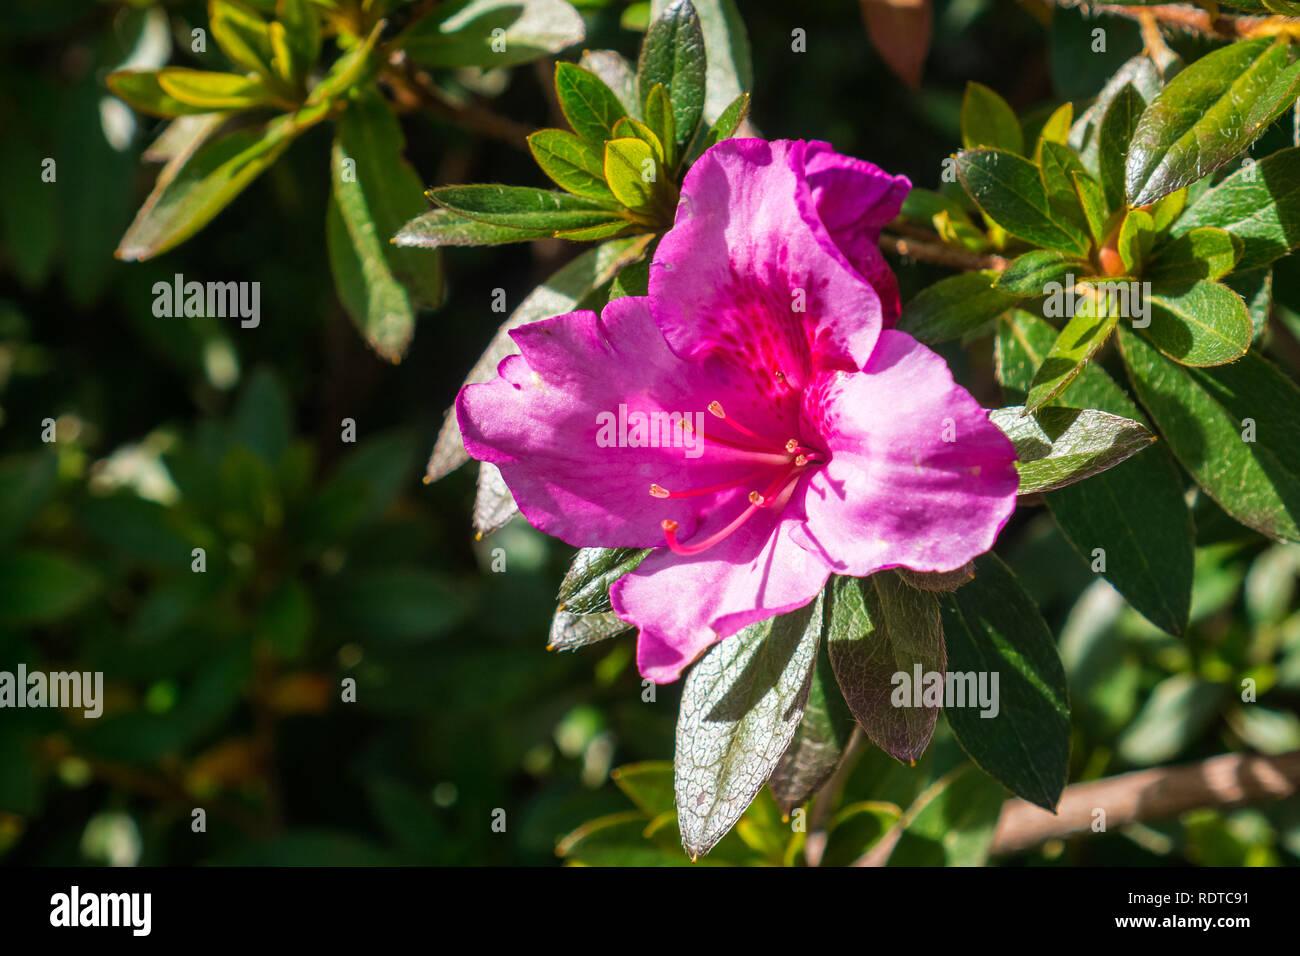 Blooming Pink Azalea flowers (Rhododendron Arboreum), California - Stock Image